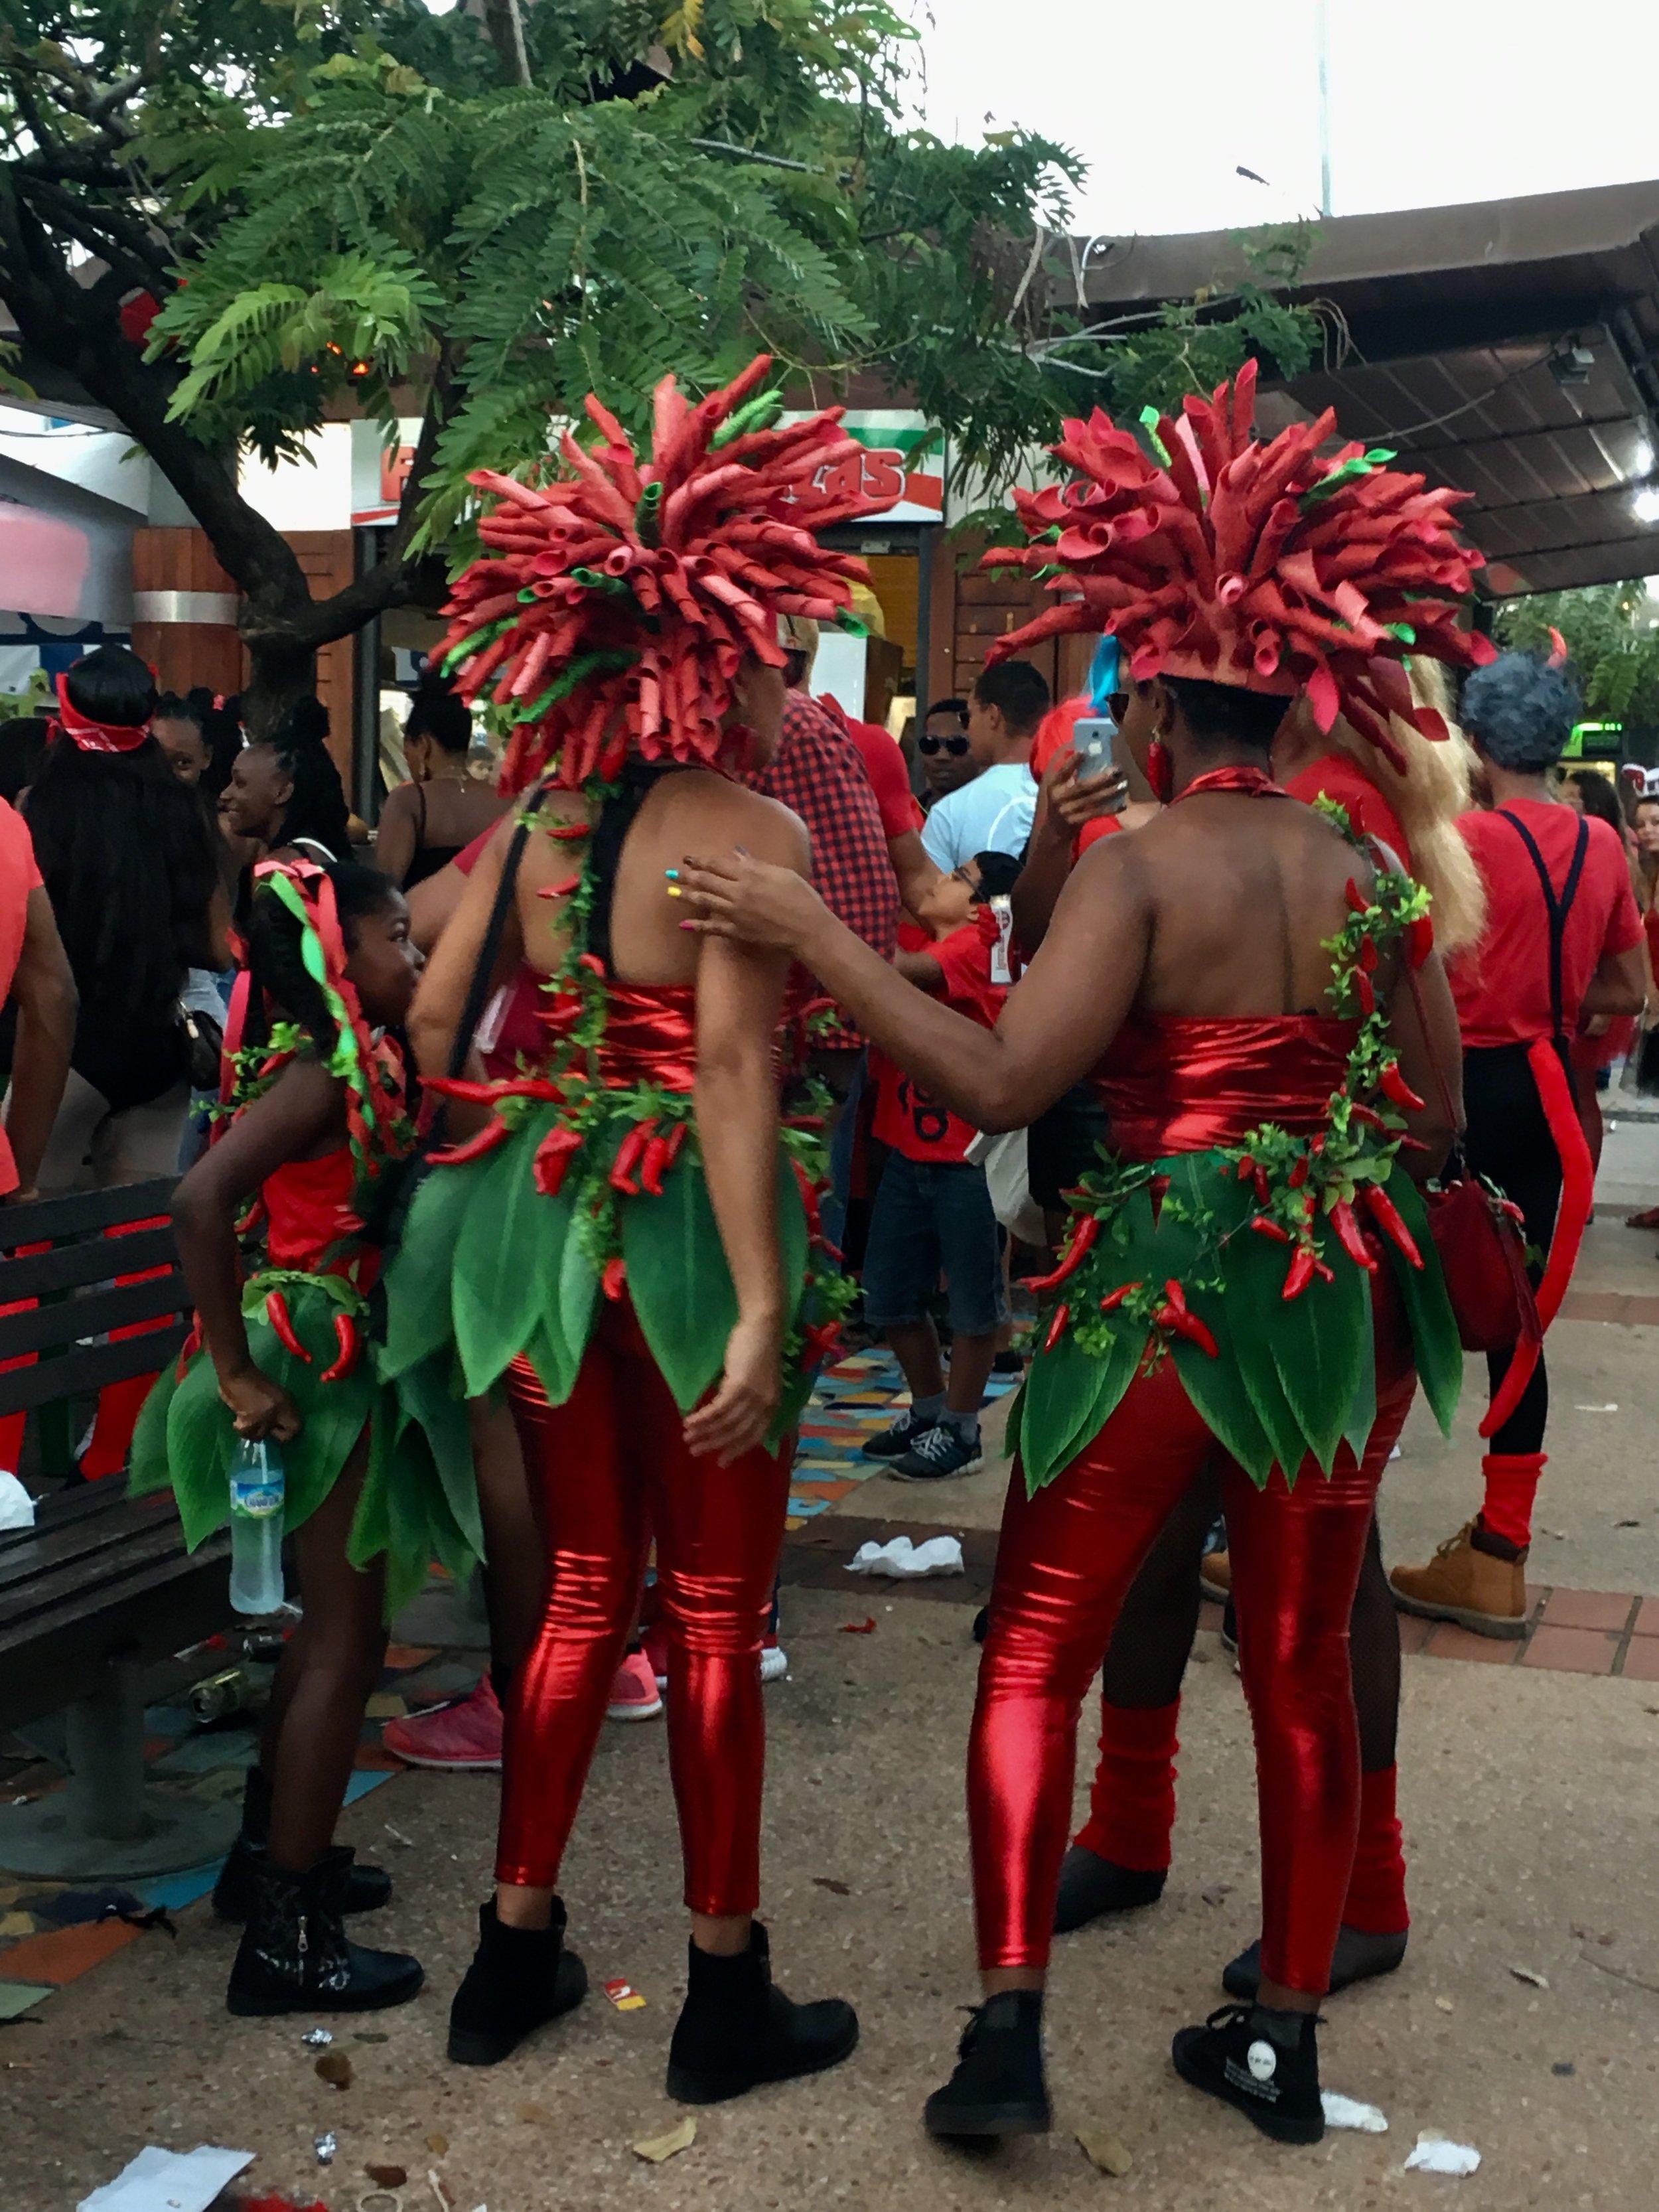 carnaval-costumes-red.jpg